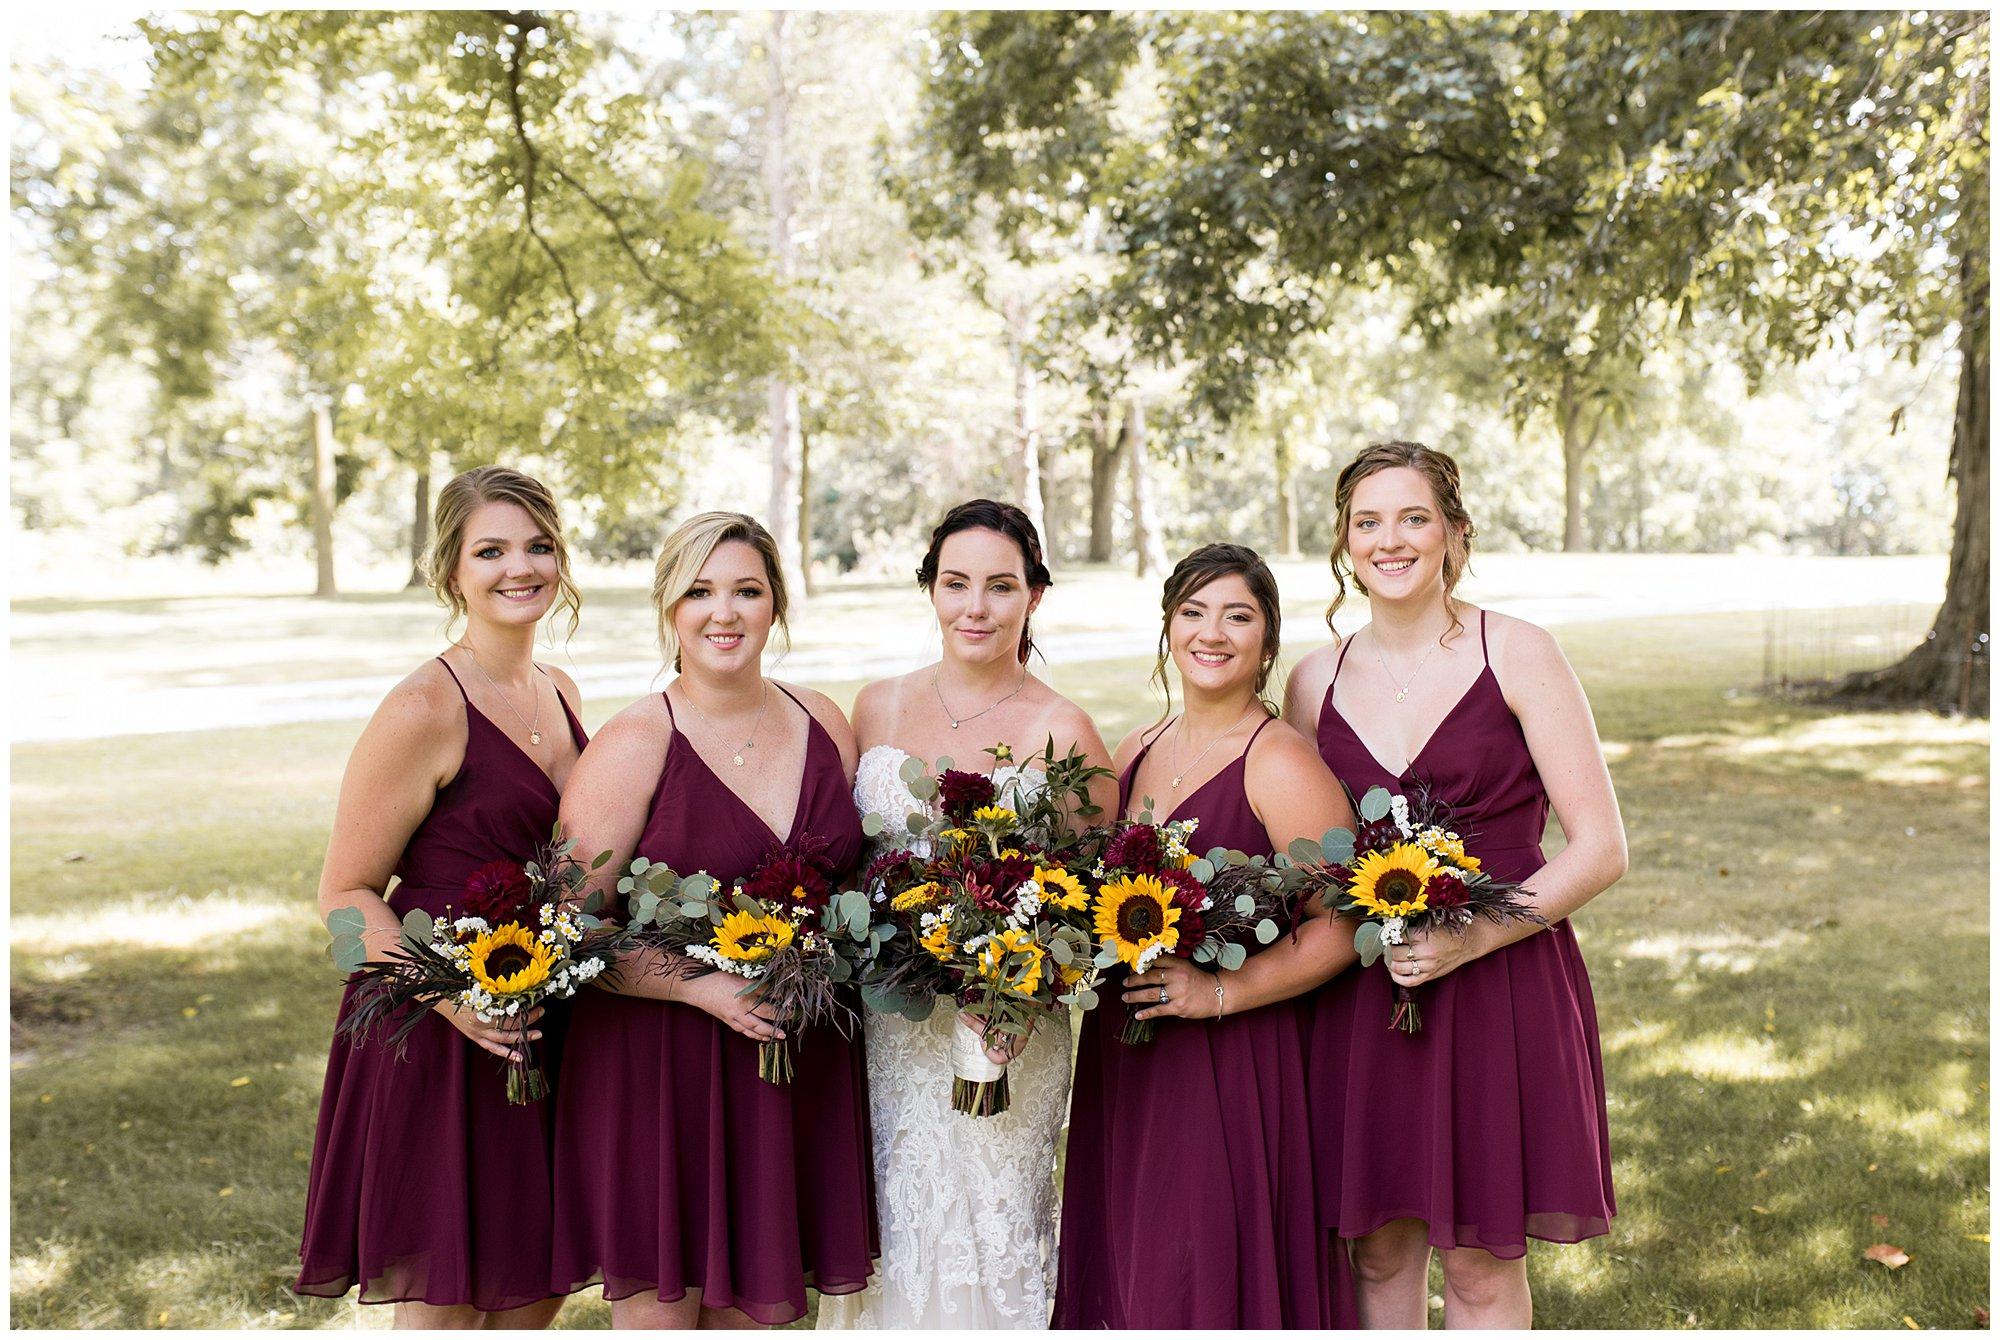 bride and bridesmaids before wedding ceremony